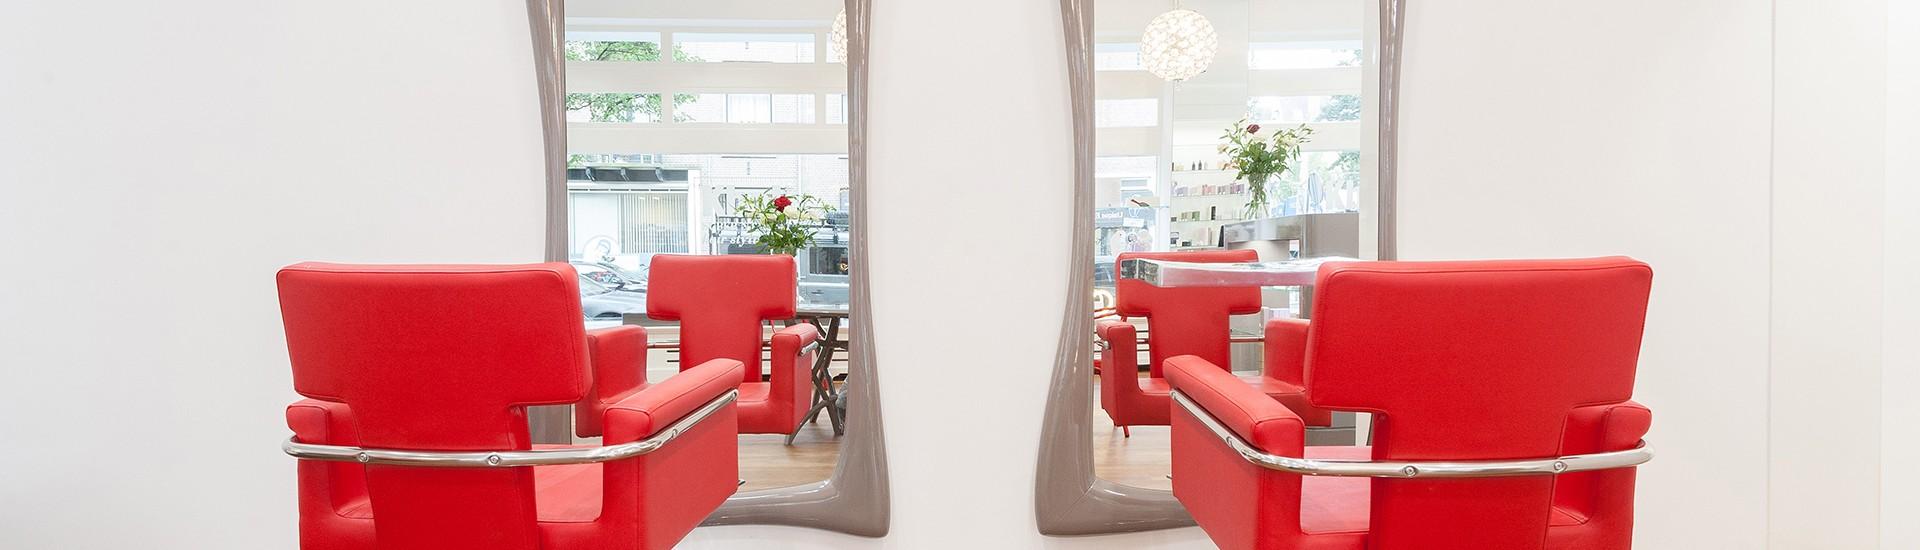 Kbal-hairstylist-Kapsalon-Amsterdam-kapper-stoelen-spiegel